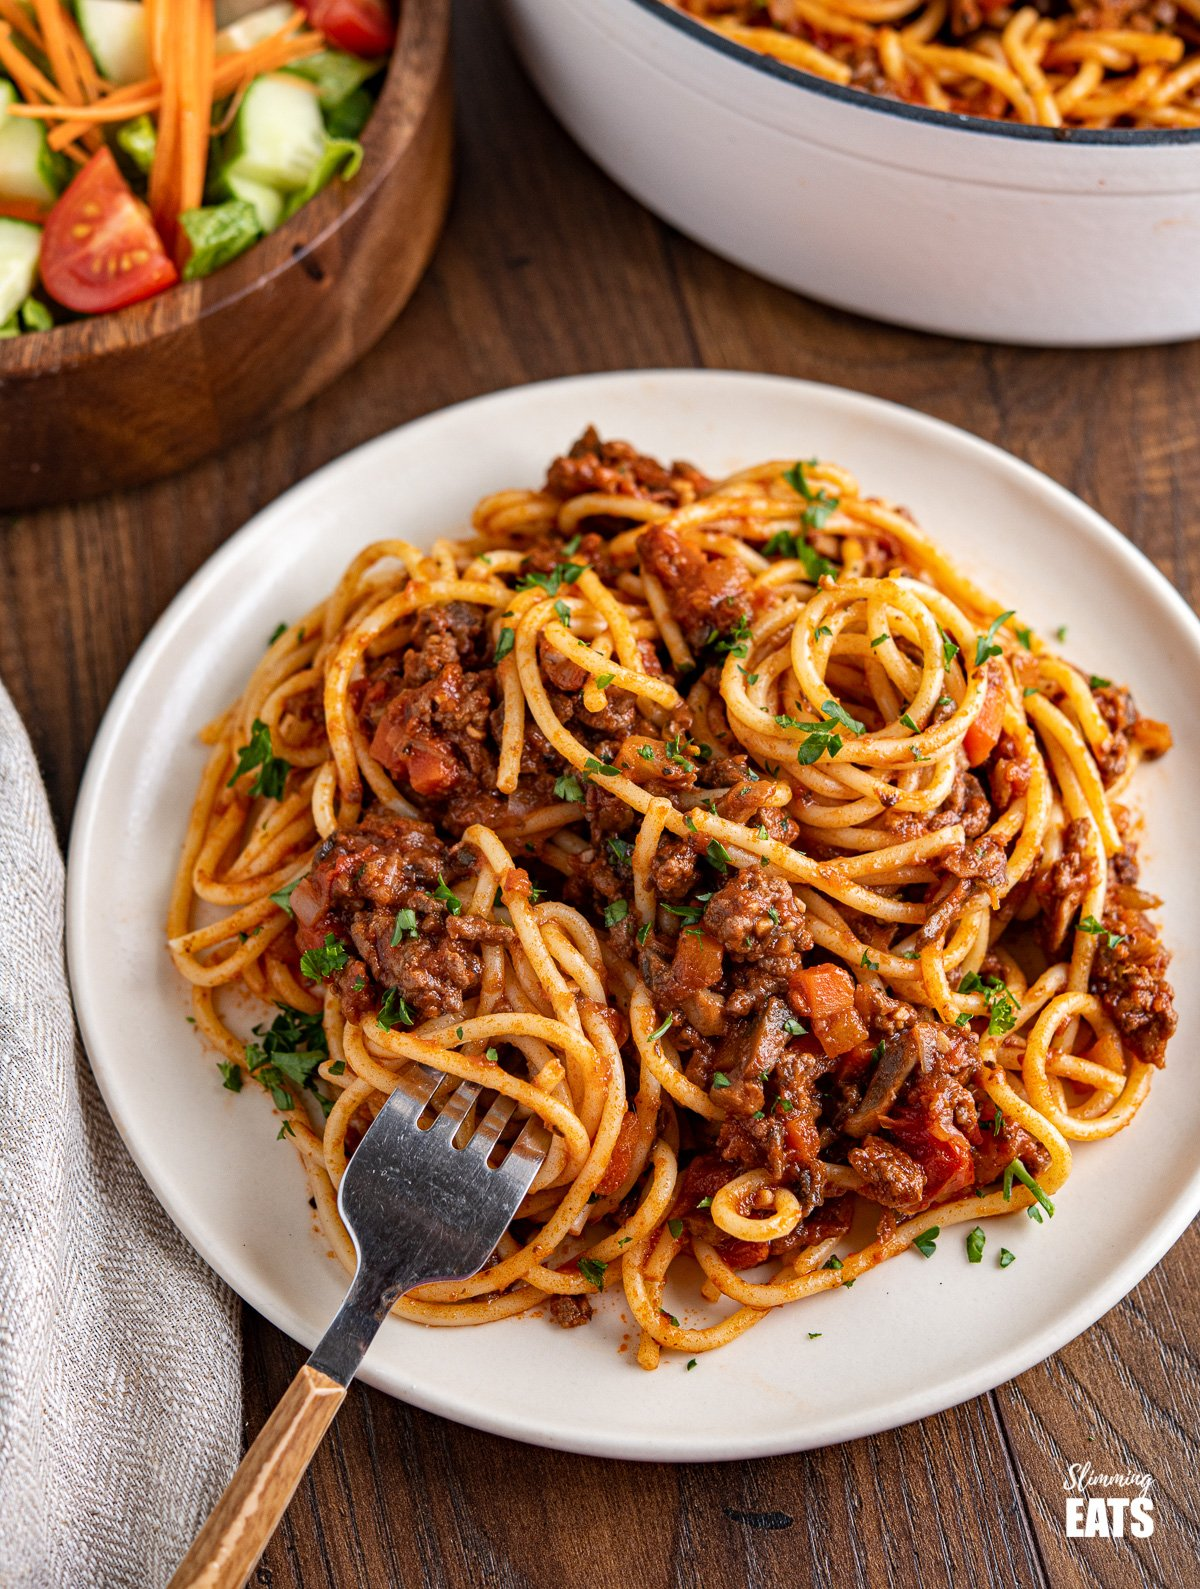 CETODIET - Pr; Spaghetti Bolognese Slimming Paration